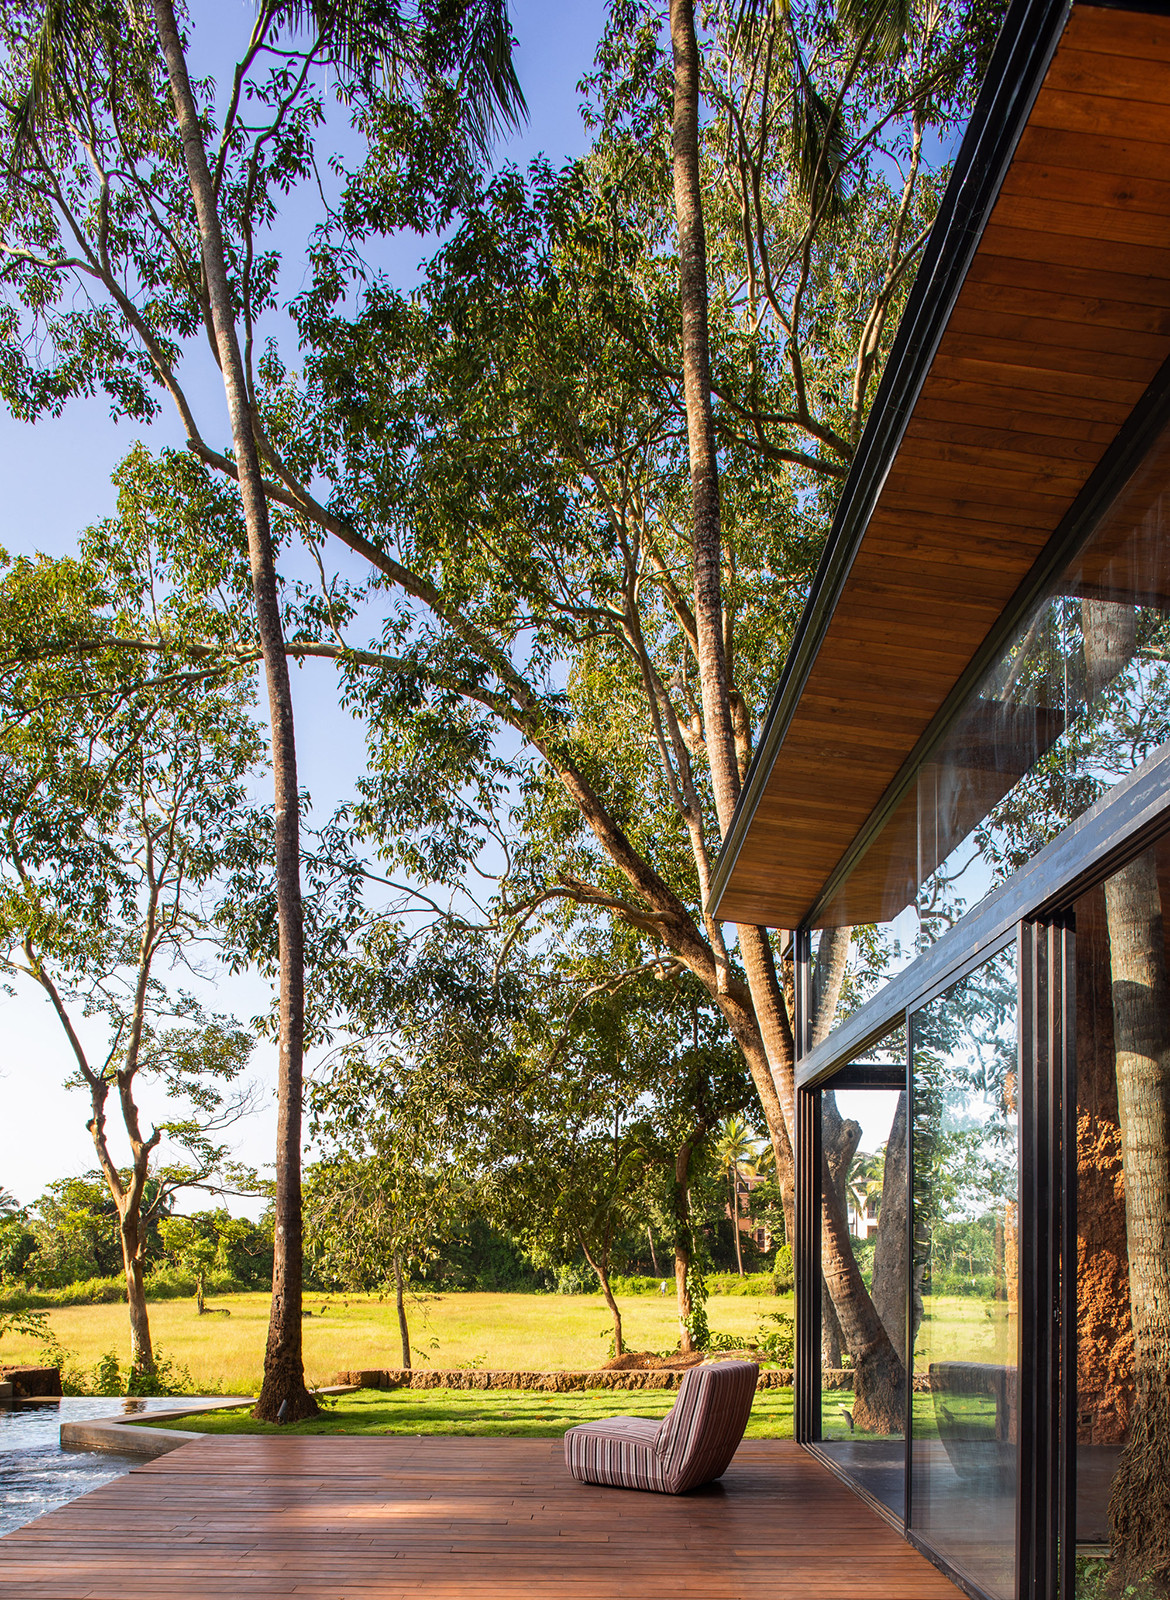 Villa In The Palms Abraham Jon Architects exterior deck